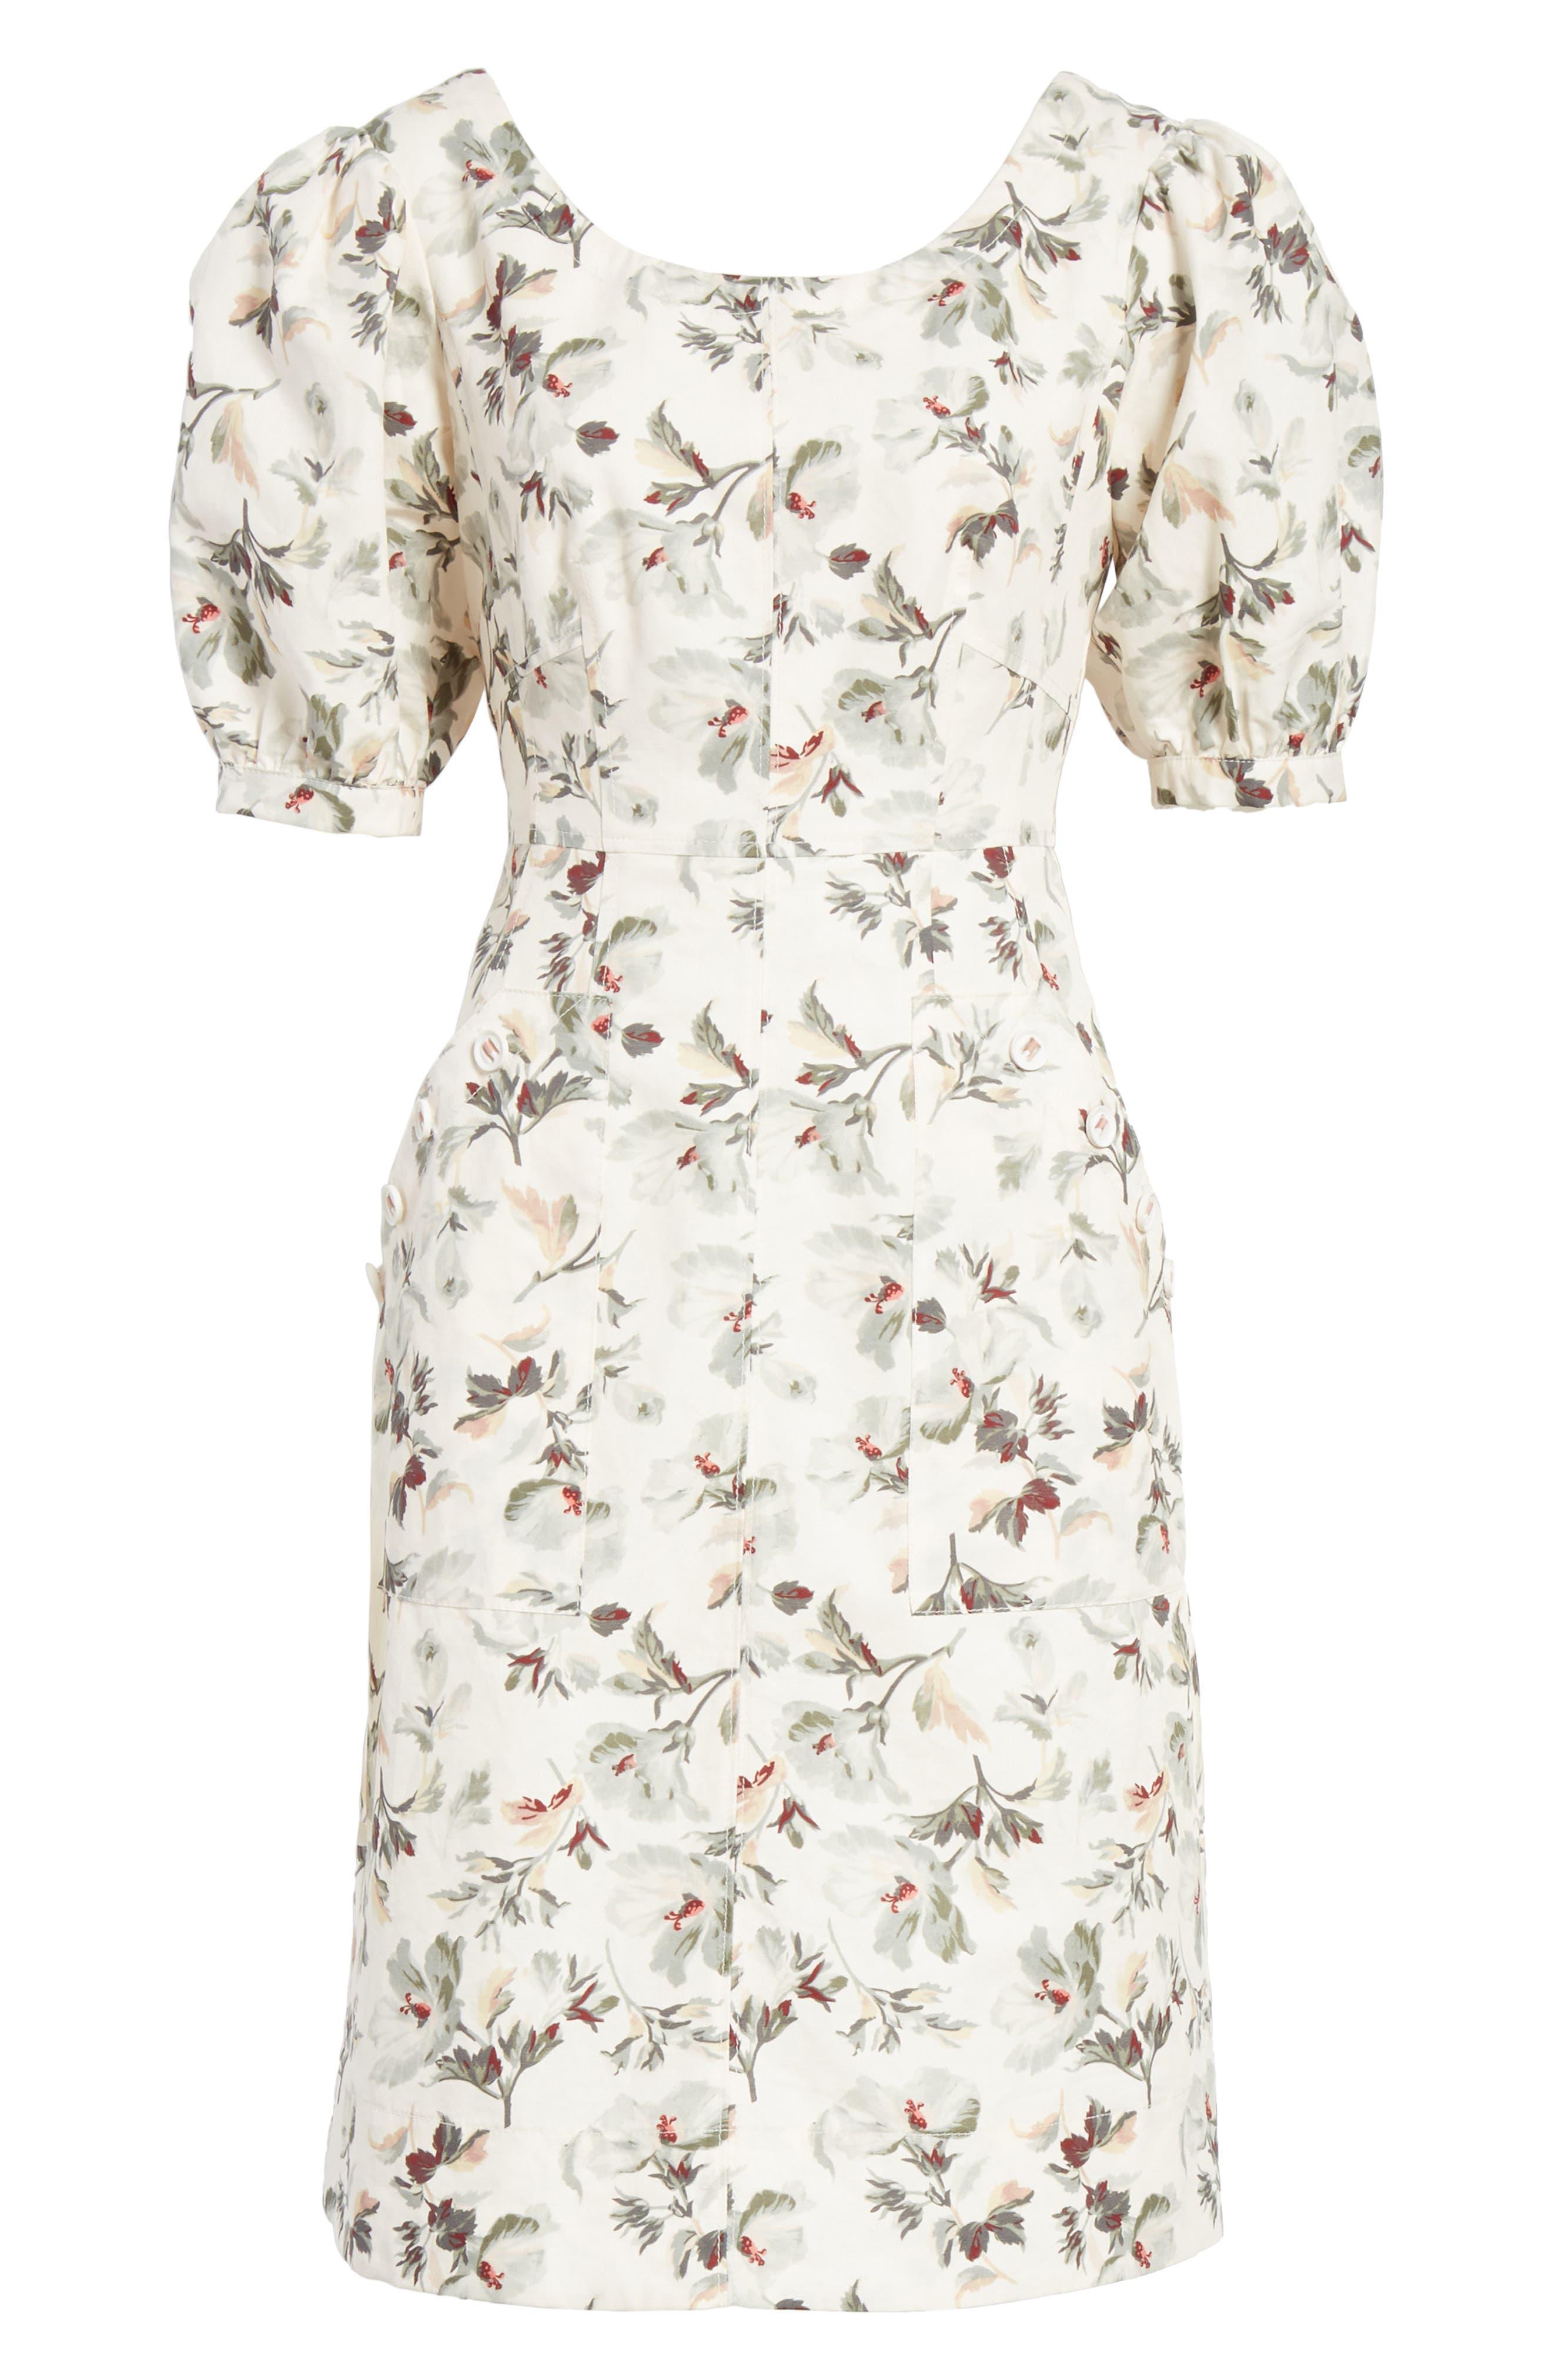 Puff Sleeve Floral Cotton Linen Dress,                             Alternate thumbnail 6, color,                             VANILLA COMBO